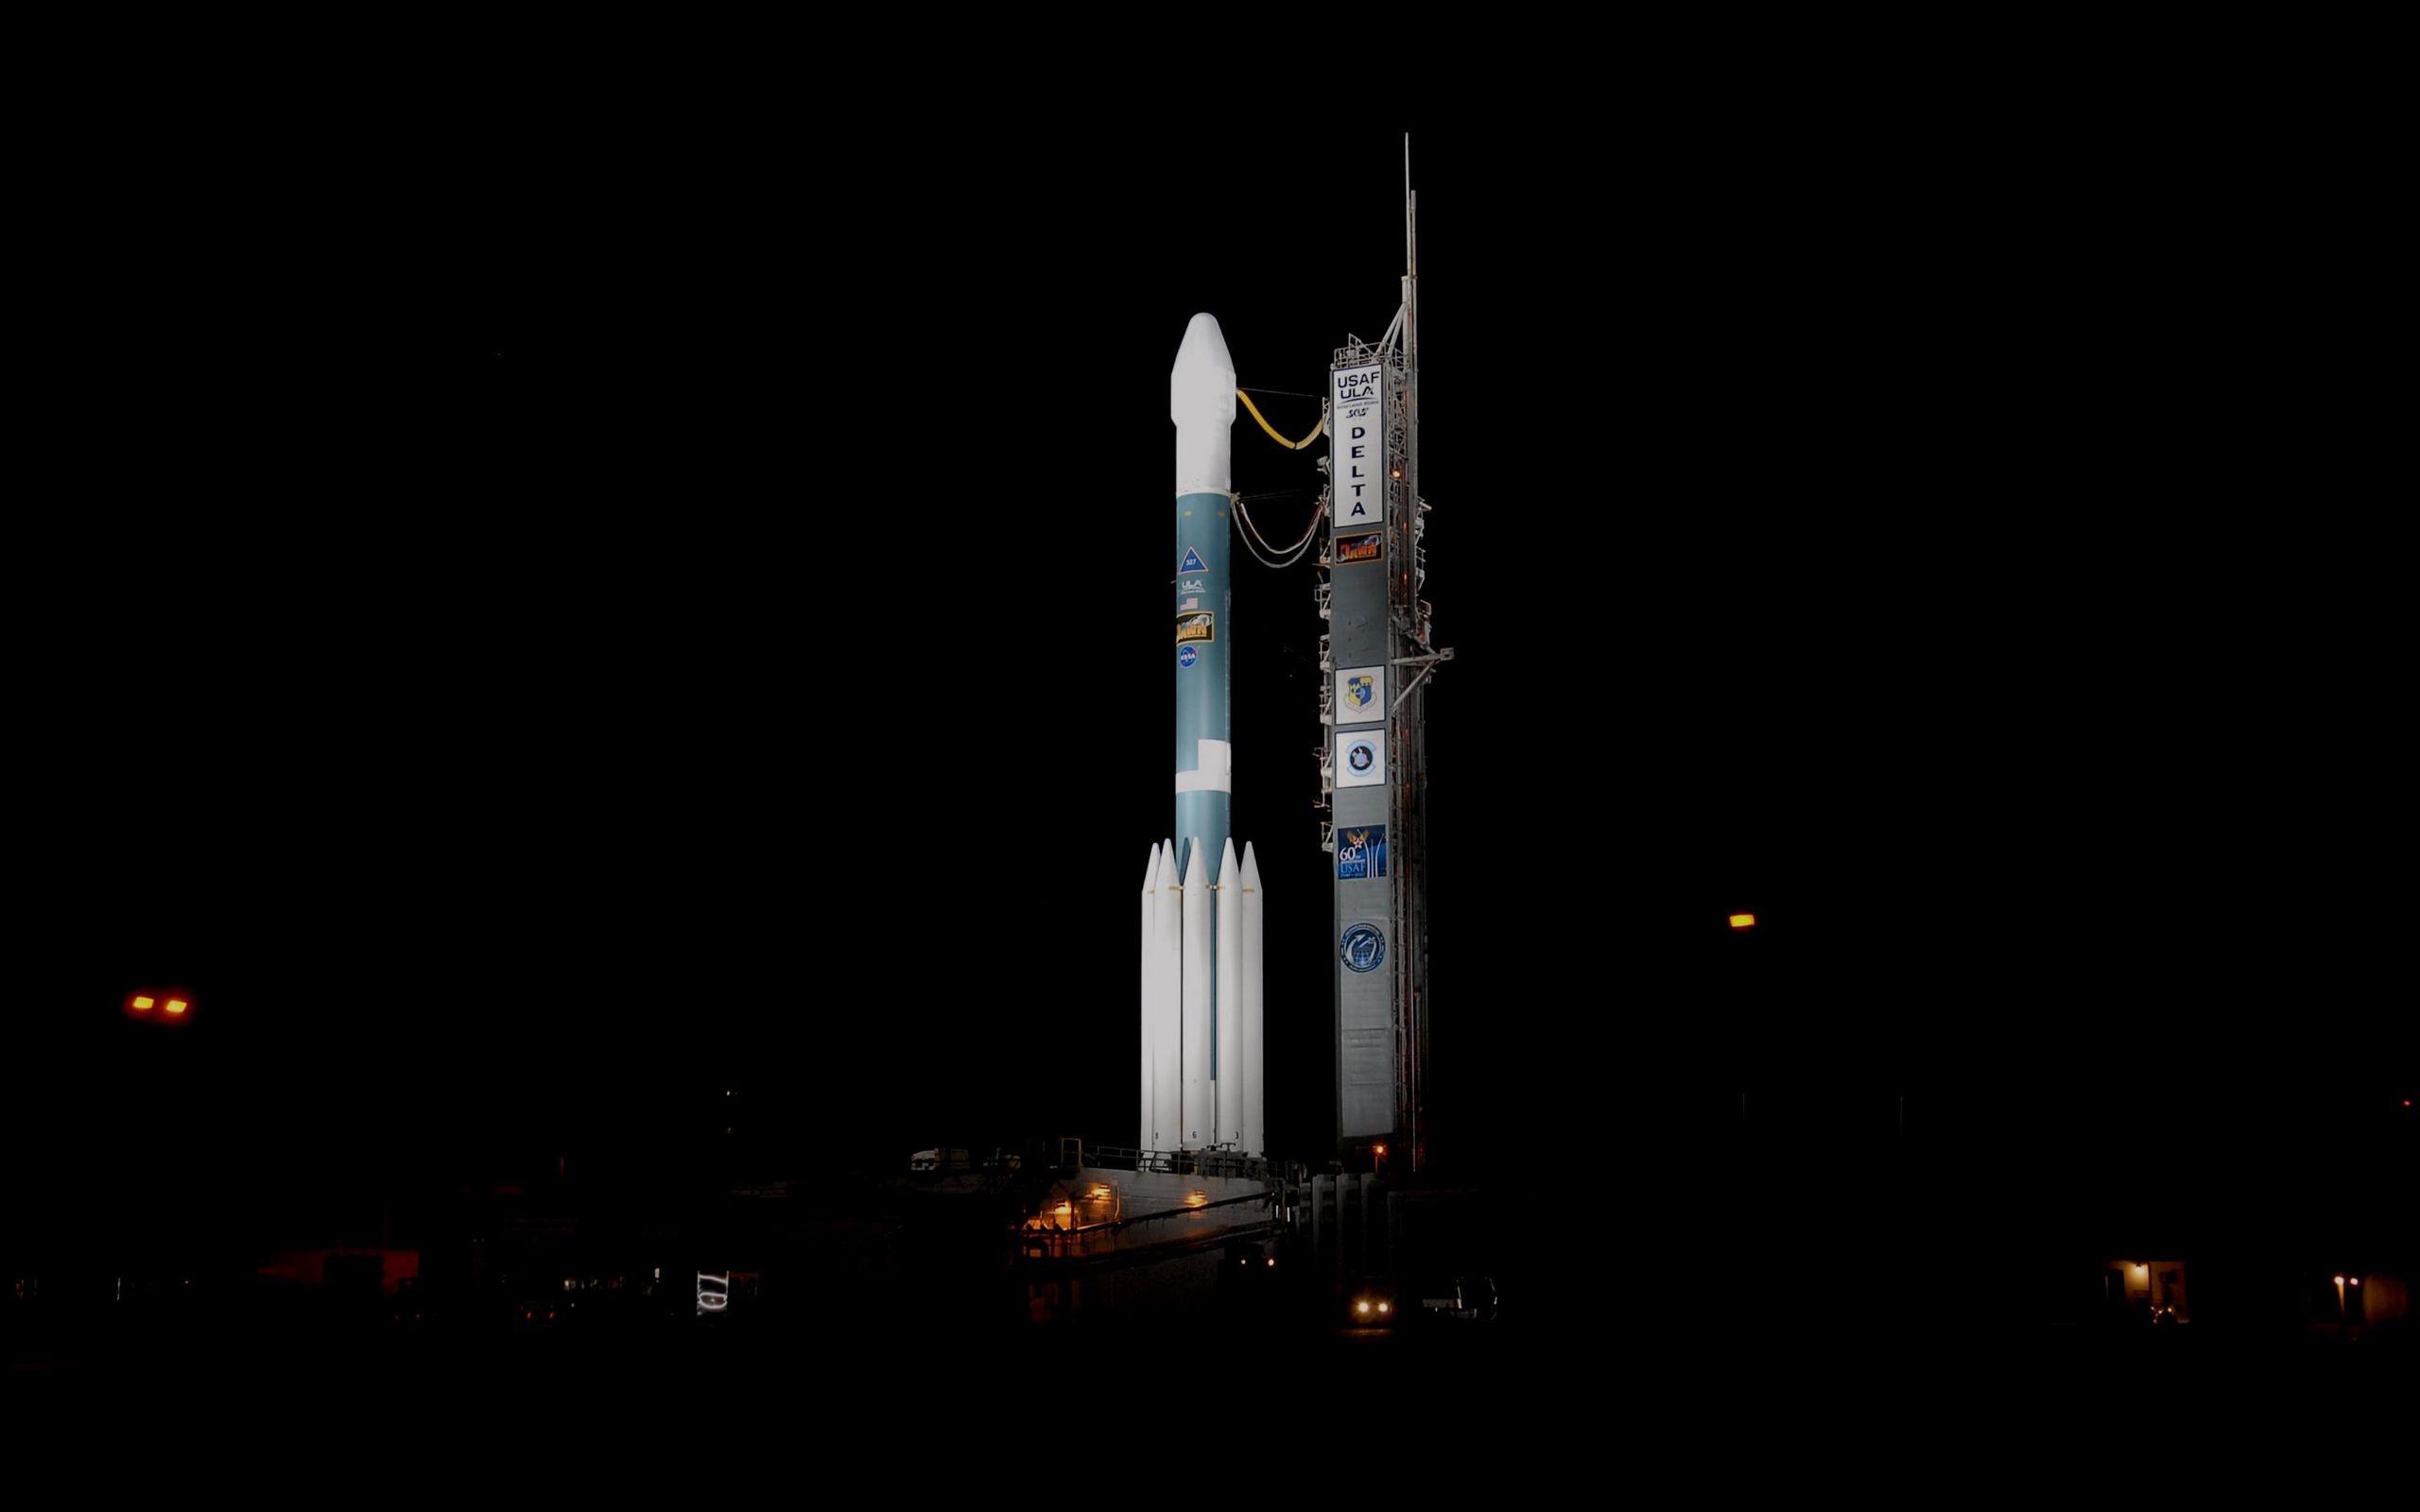 2560x1600 Wallpaper rocket, cosmodrome, night